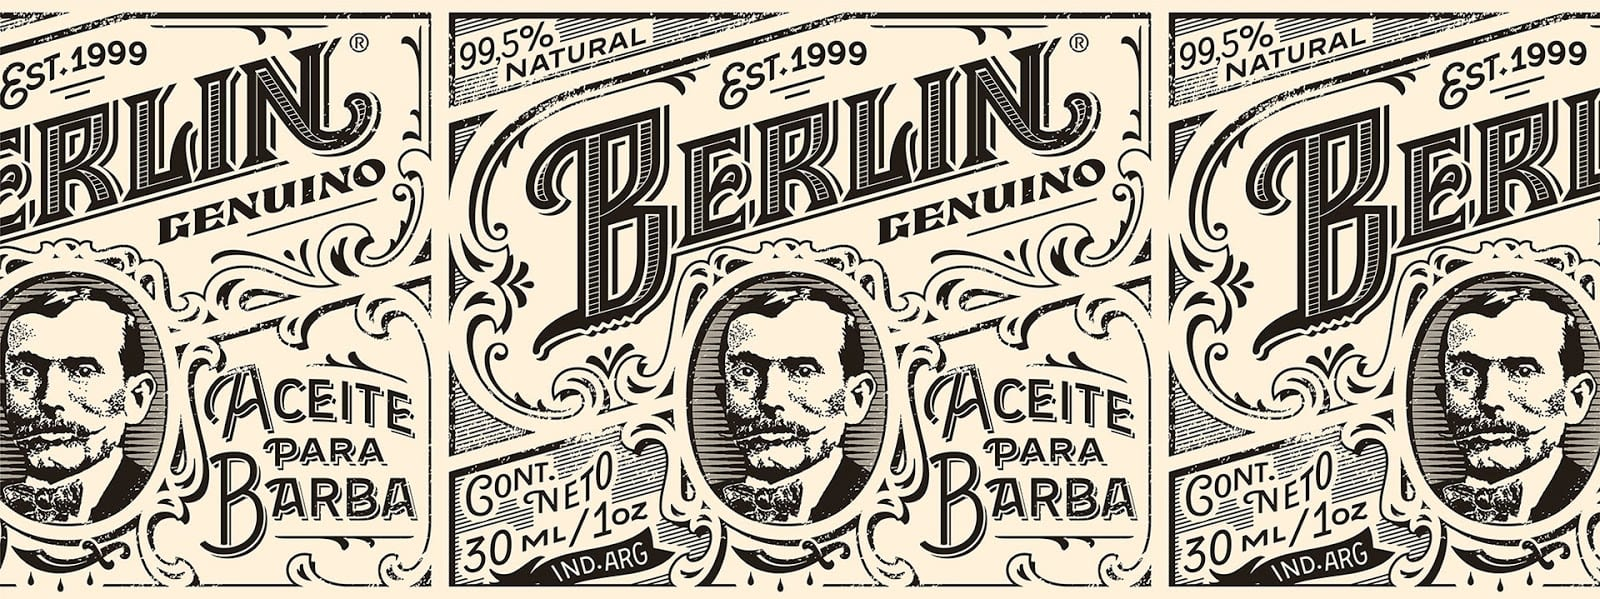 Berlin Genuino 03 - Ach, tie obaly – Berlin Genuino